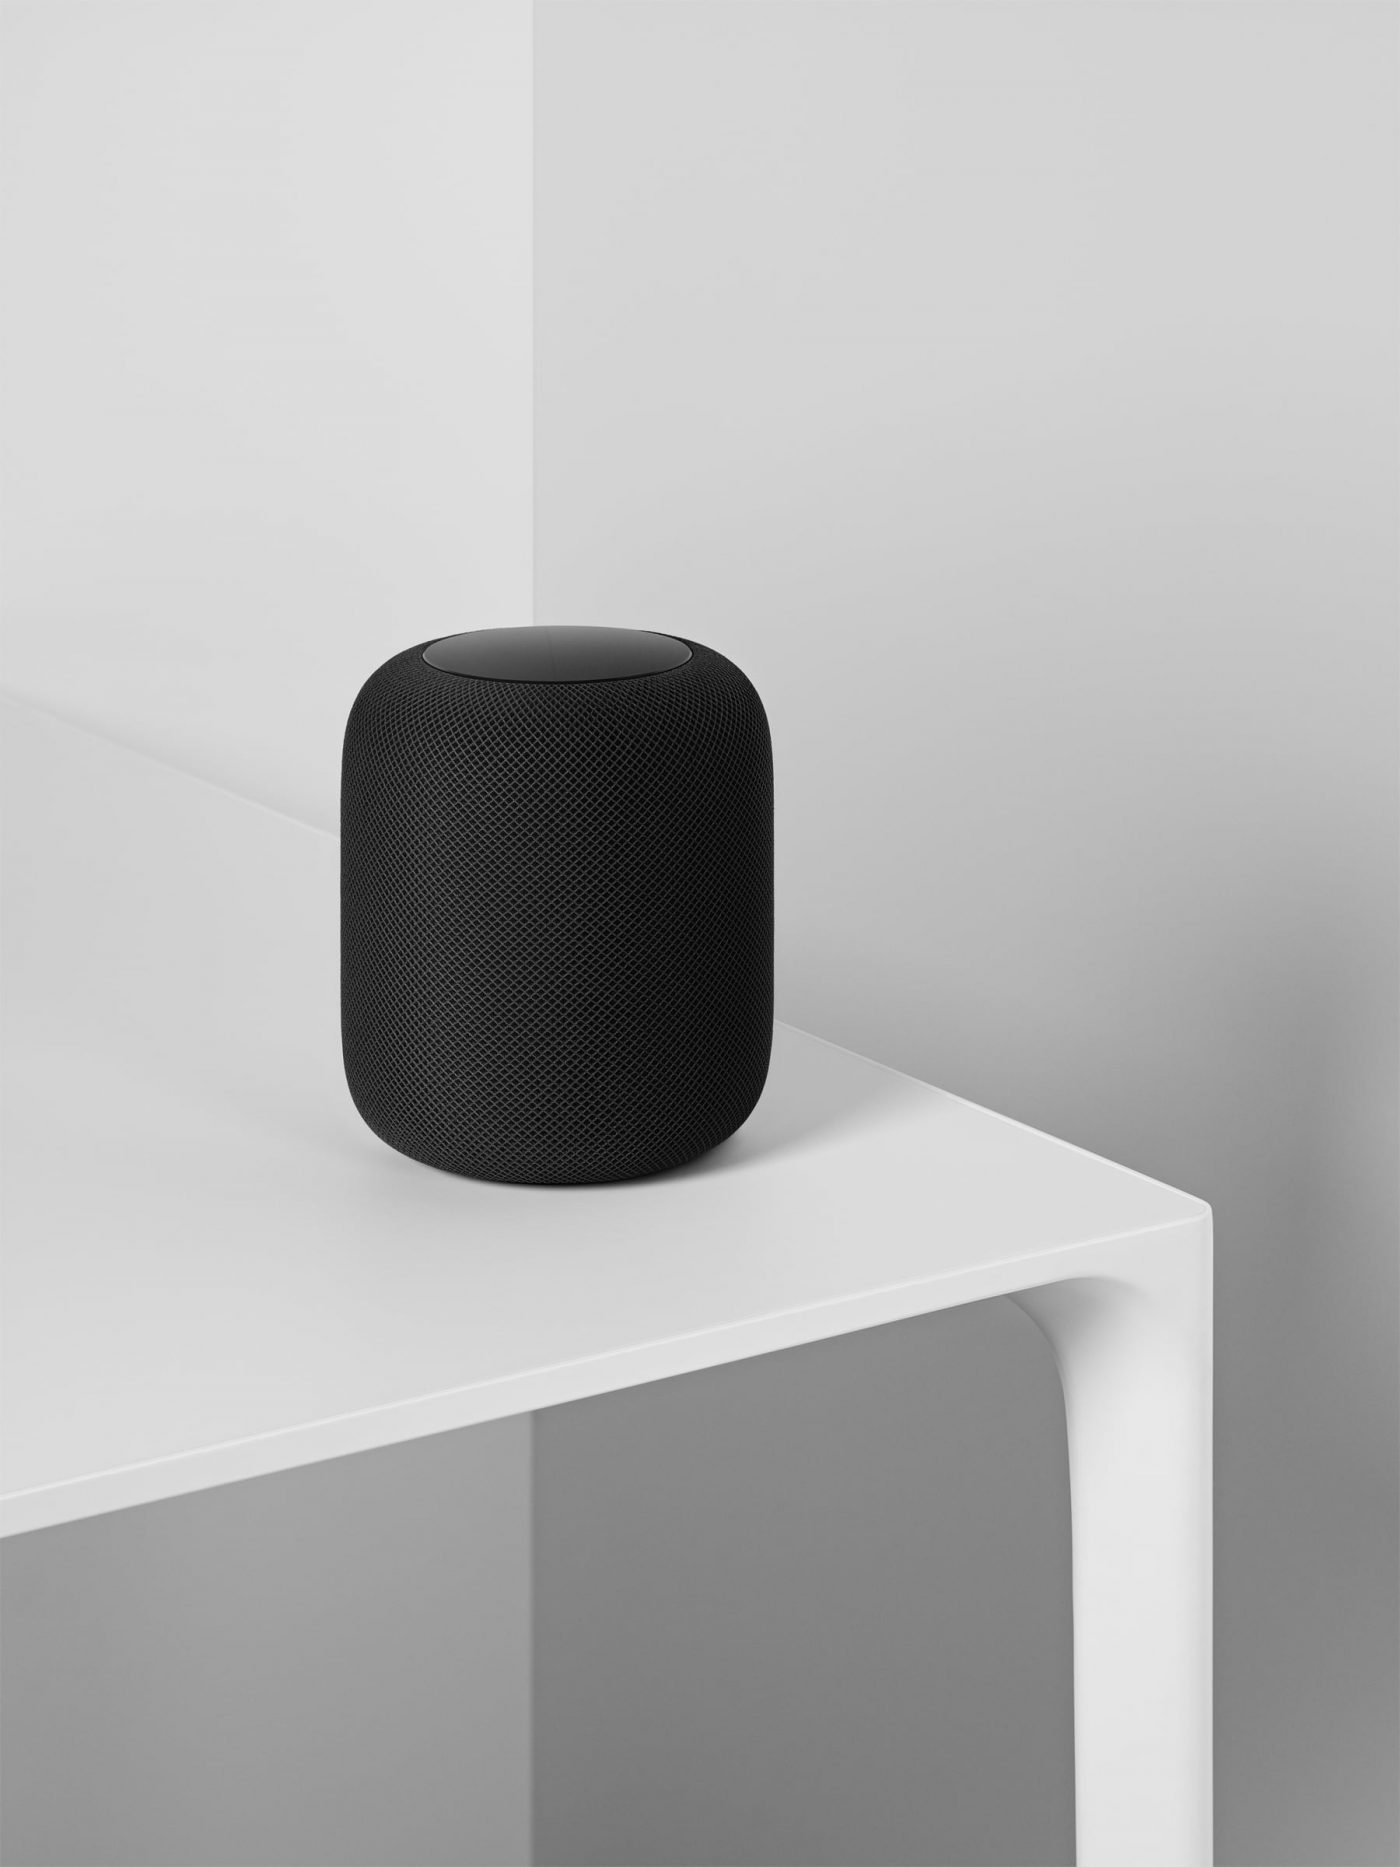 Apple HomePod in Black on table